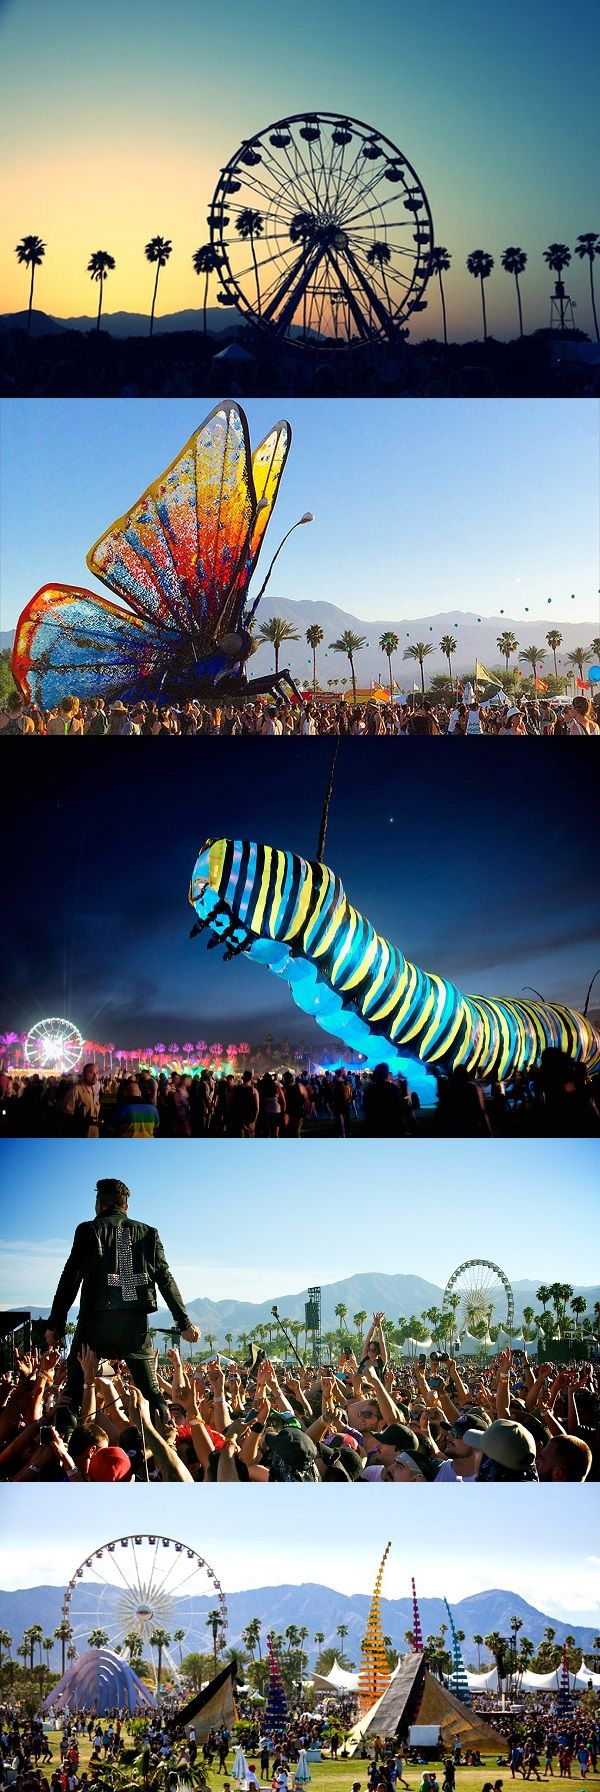 Ir al festival de música Coachella